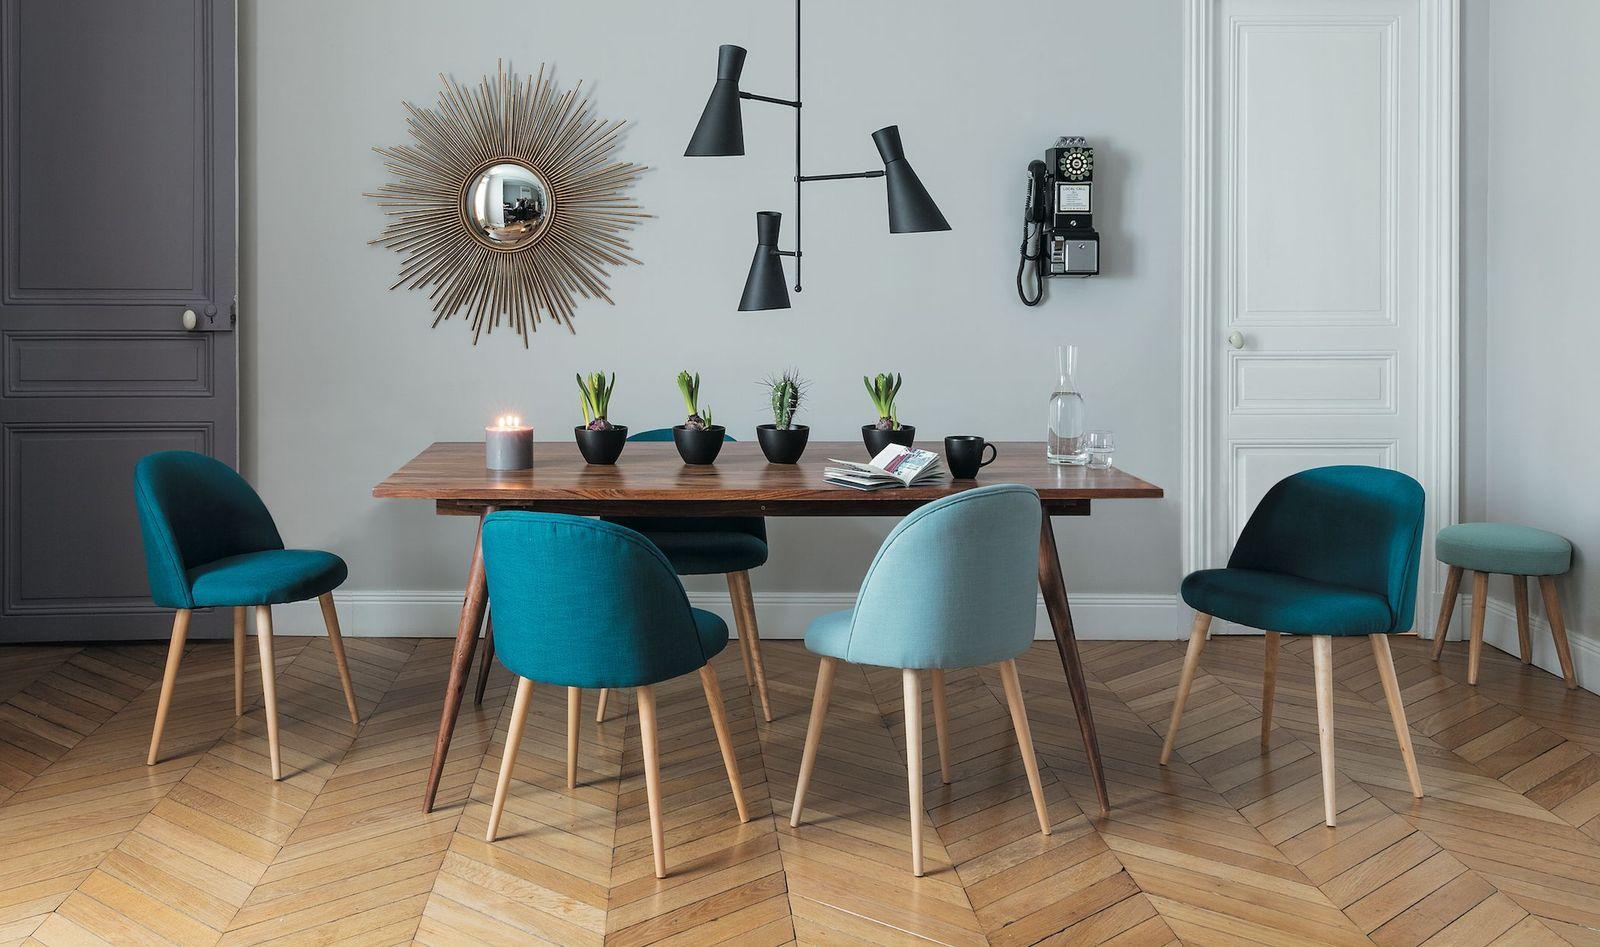 Decoraci n la casa azul ideas decorativas para dar a tu for Ideas decorativas para la casa